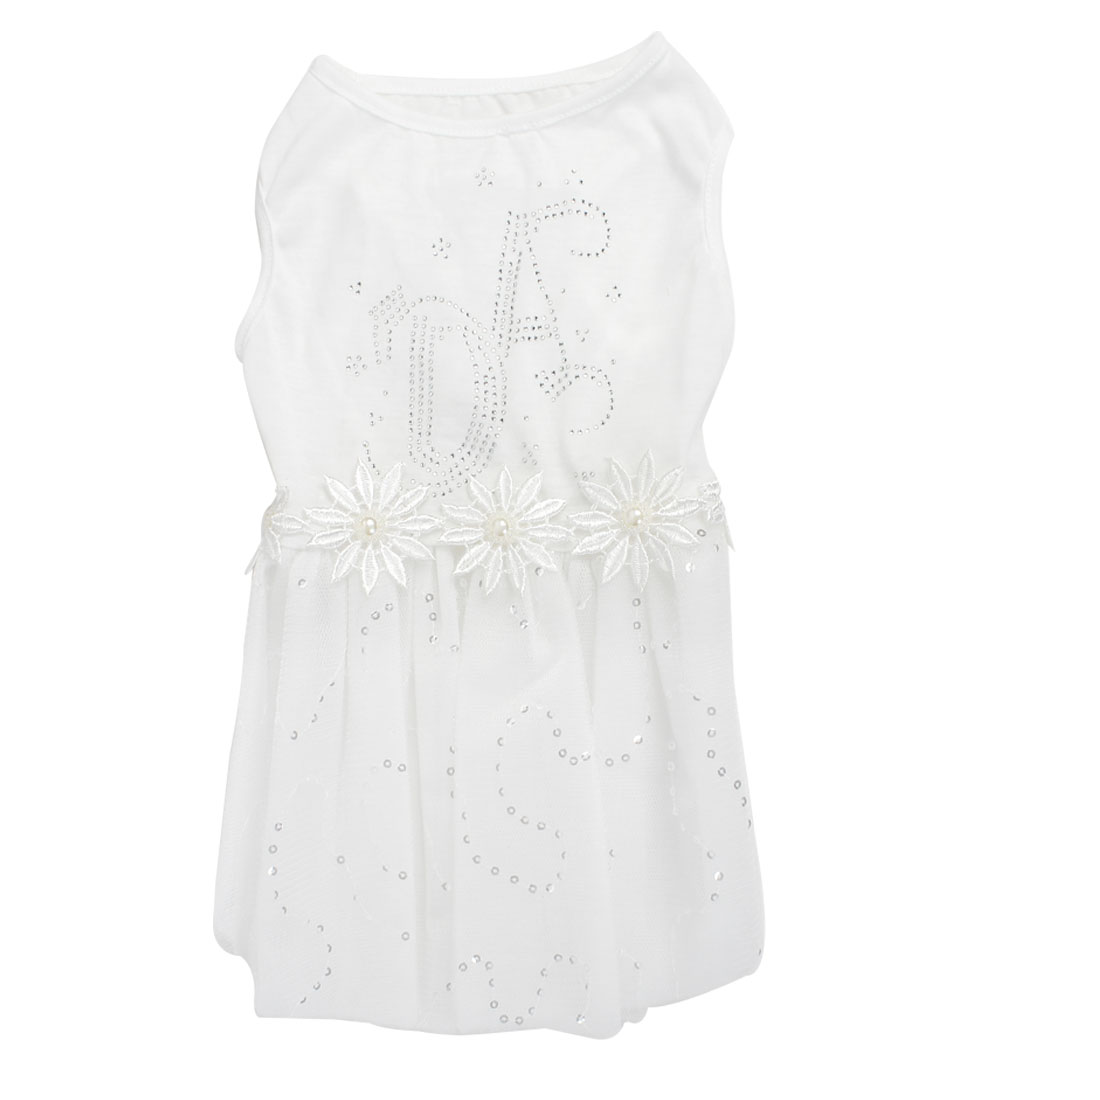 Pet Dog Doggie Flowers Decor Sleeveless Wedding Dress Skirt White Size M